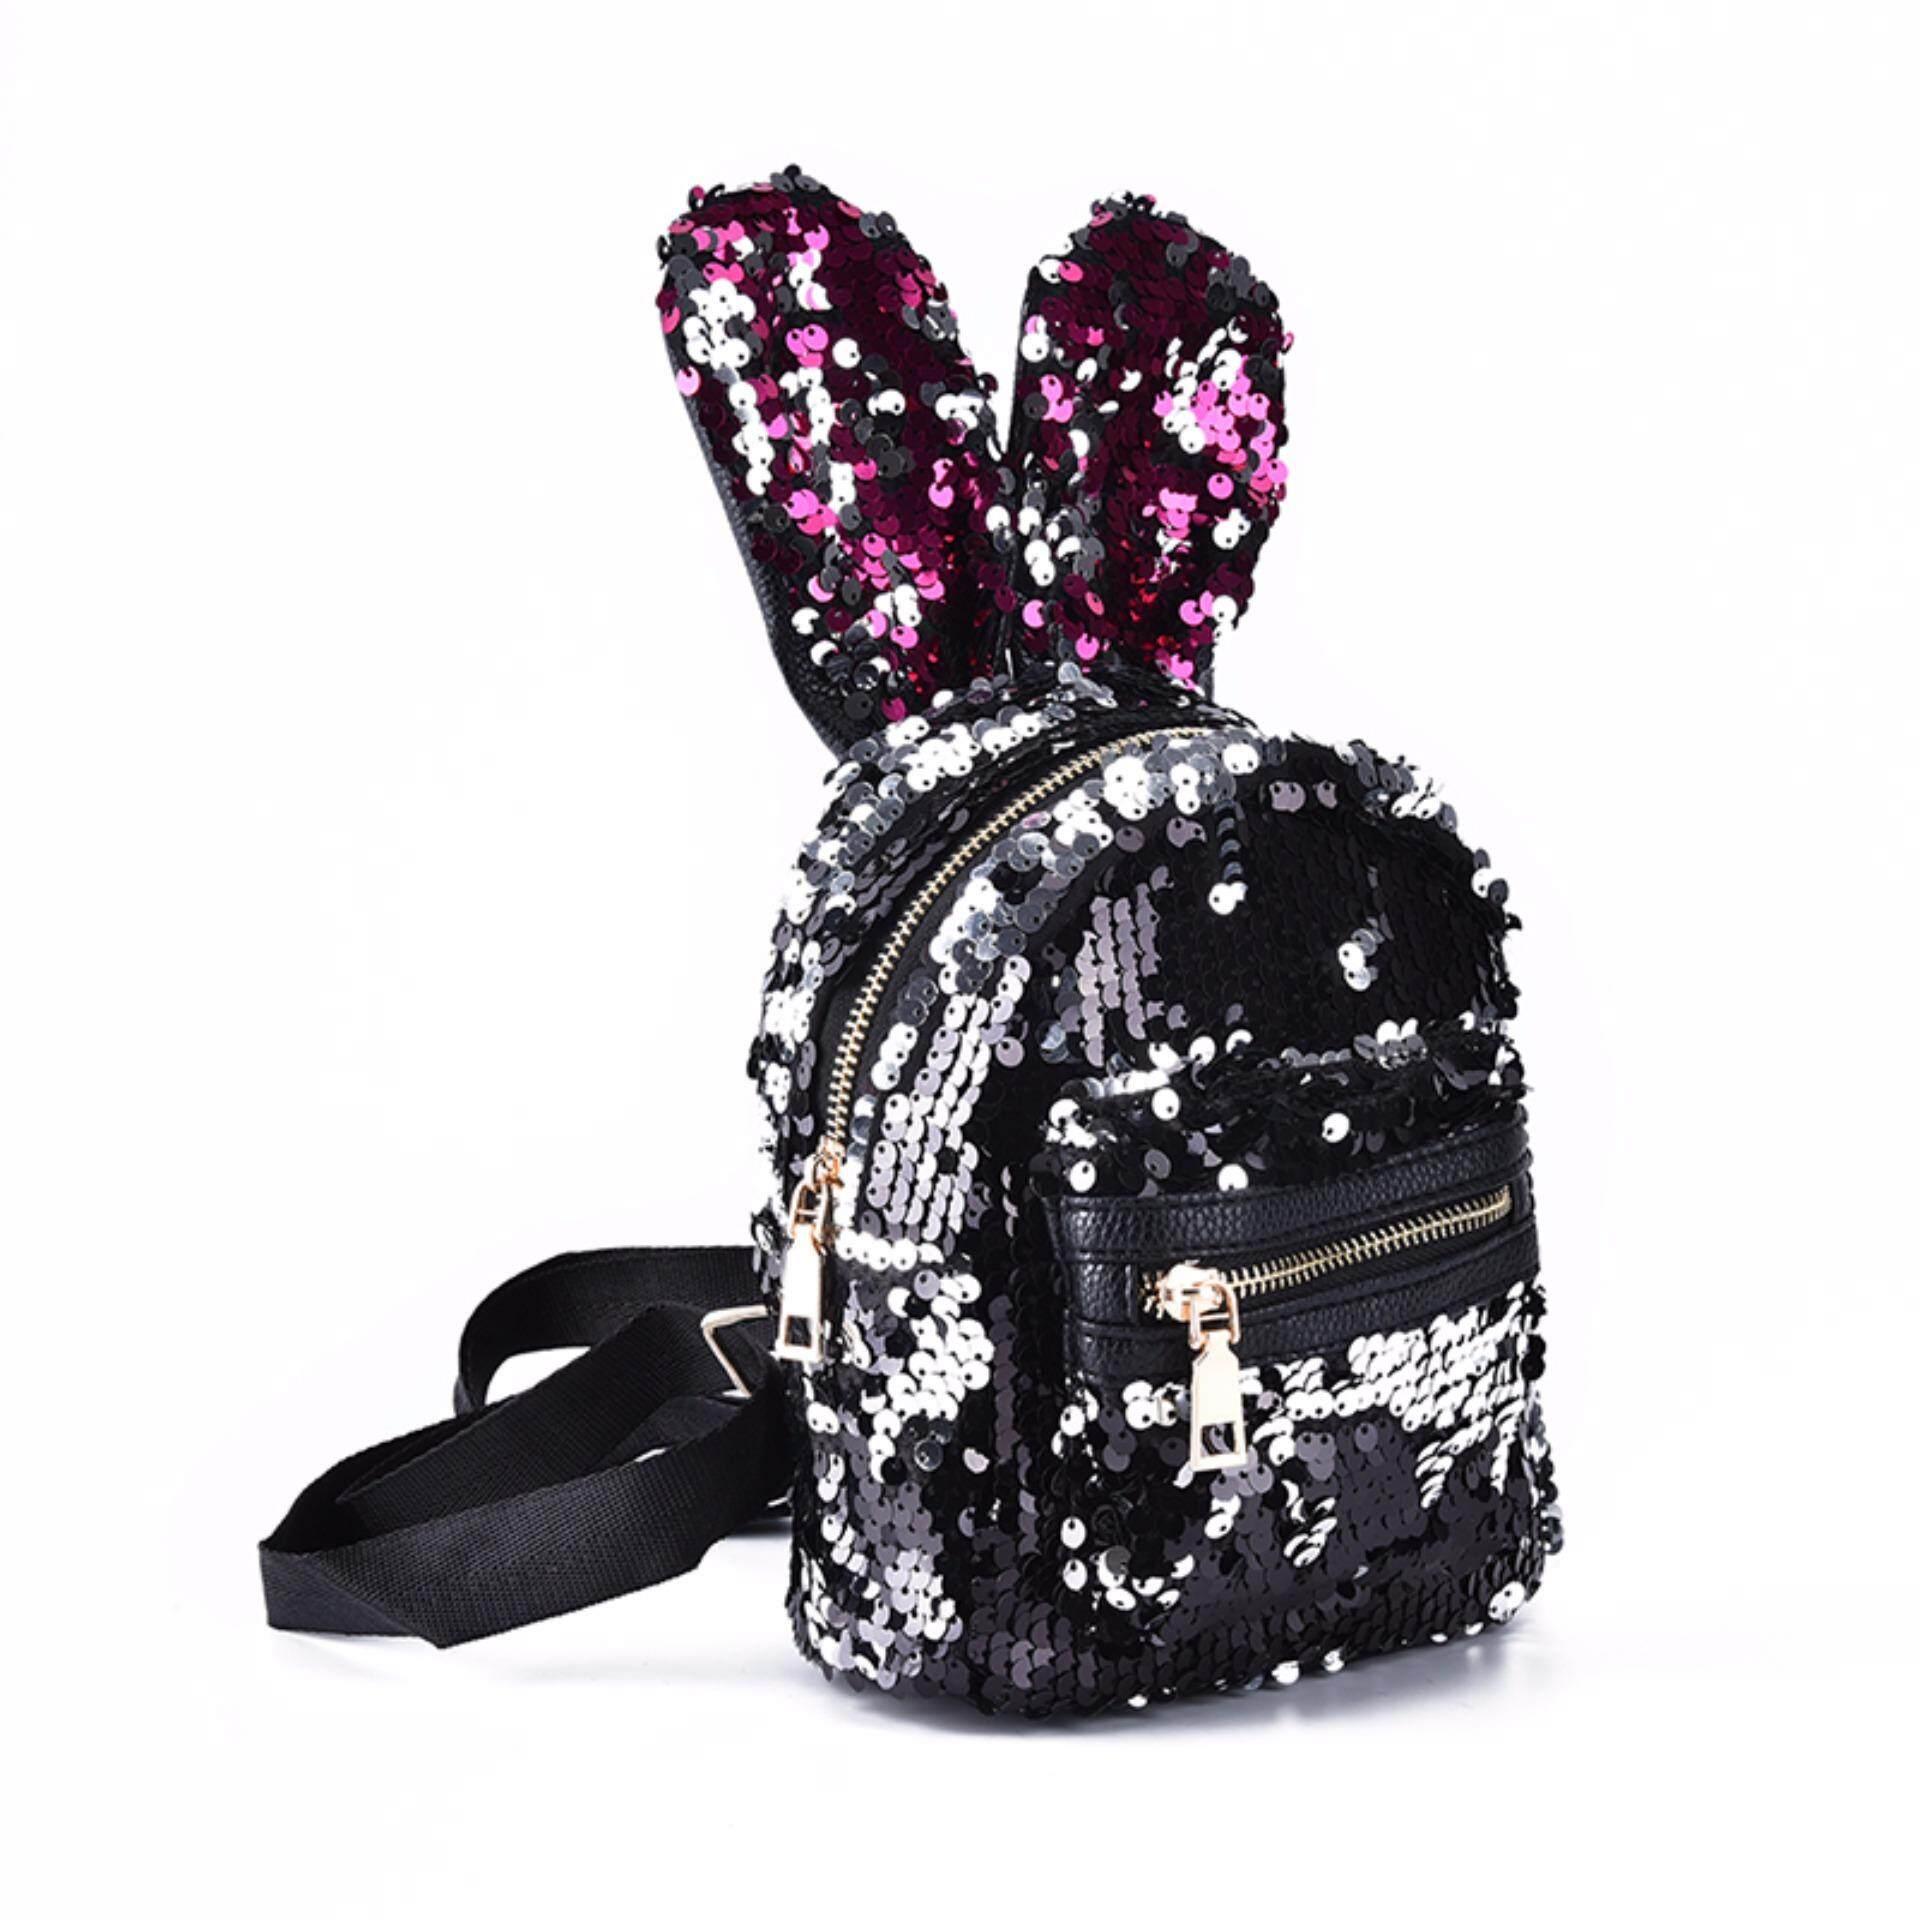 a2520d7aad Shinning Bling Sequins Cute Big Rabbit Ears Backpack Girls Women Mini  Travel Bag Black Powder